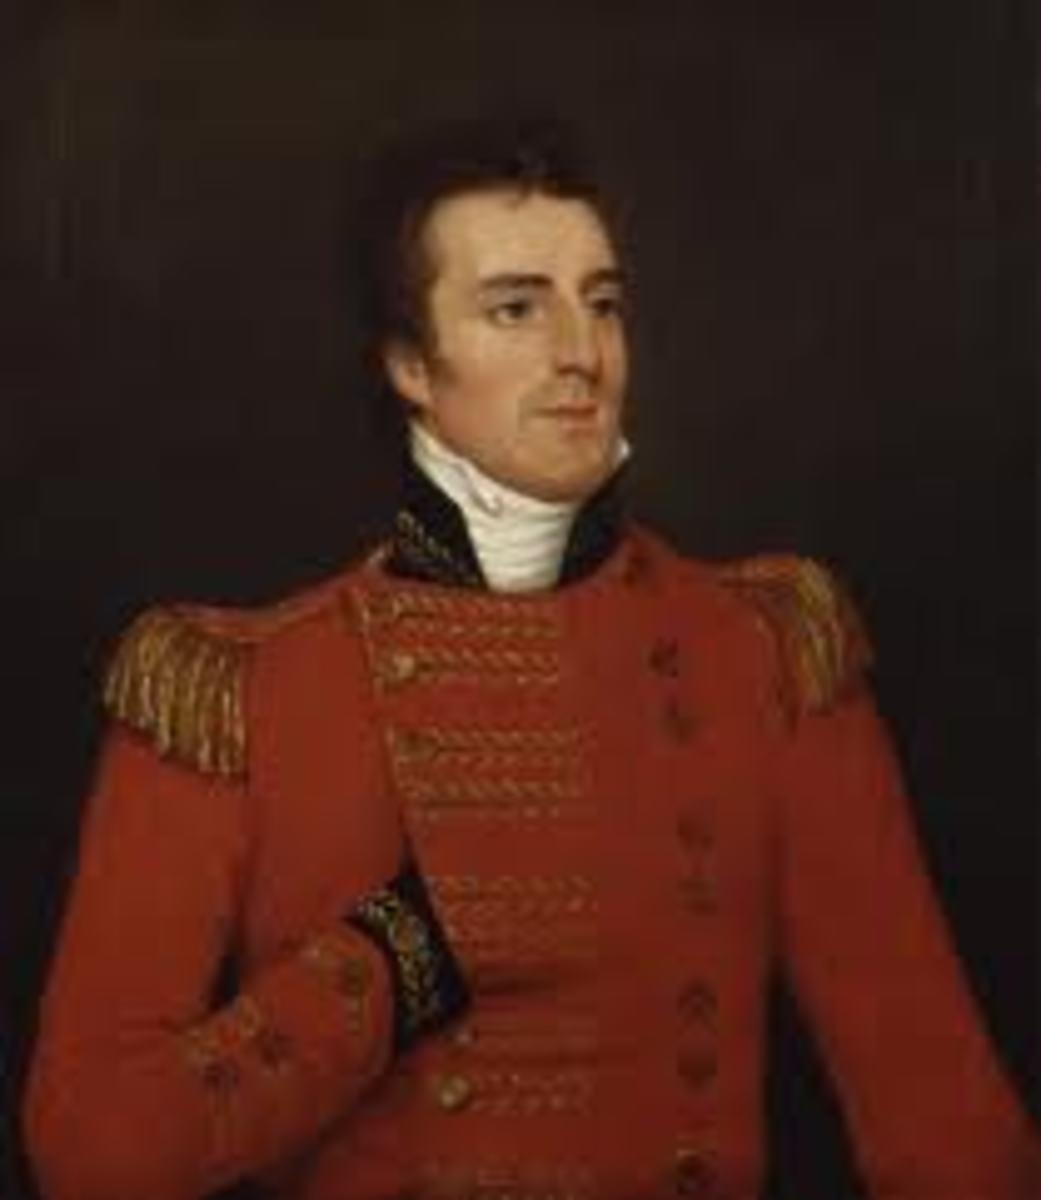 The Duke of Wellington posing like me